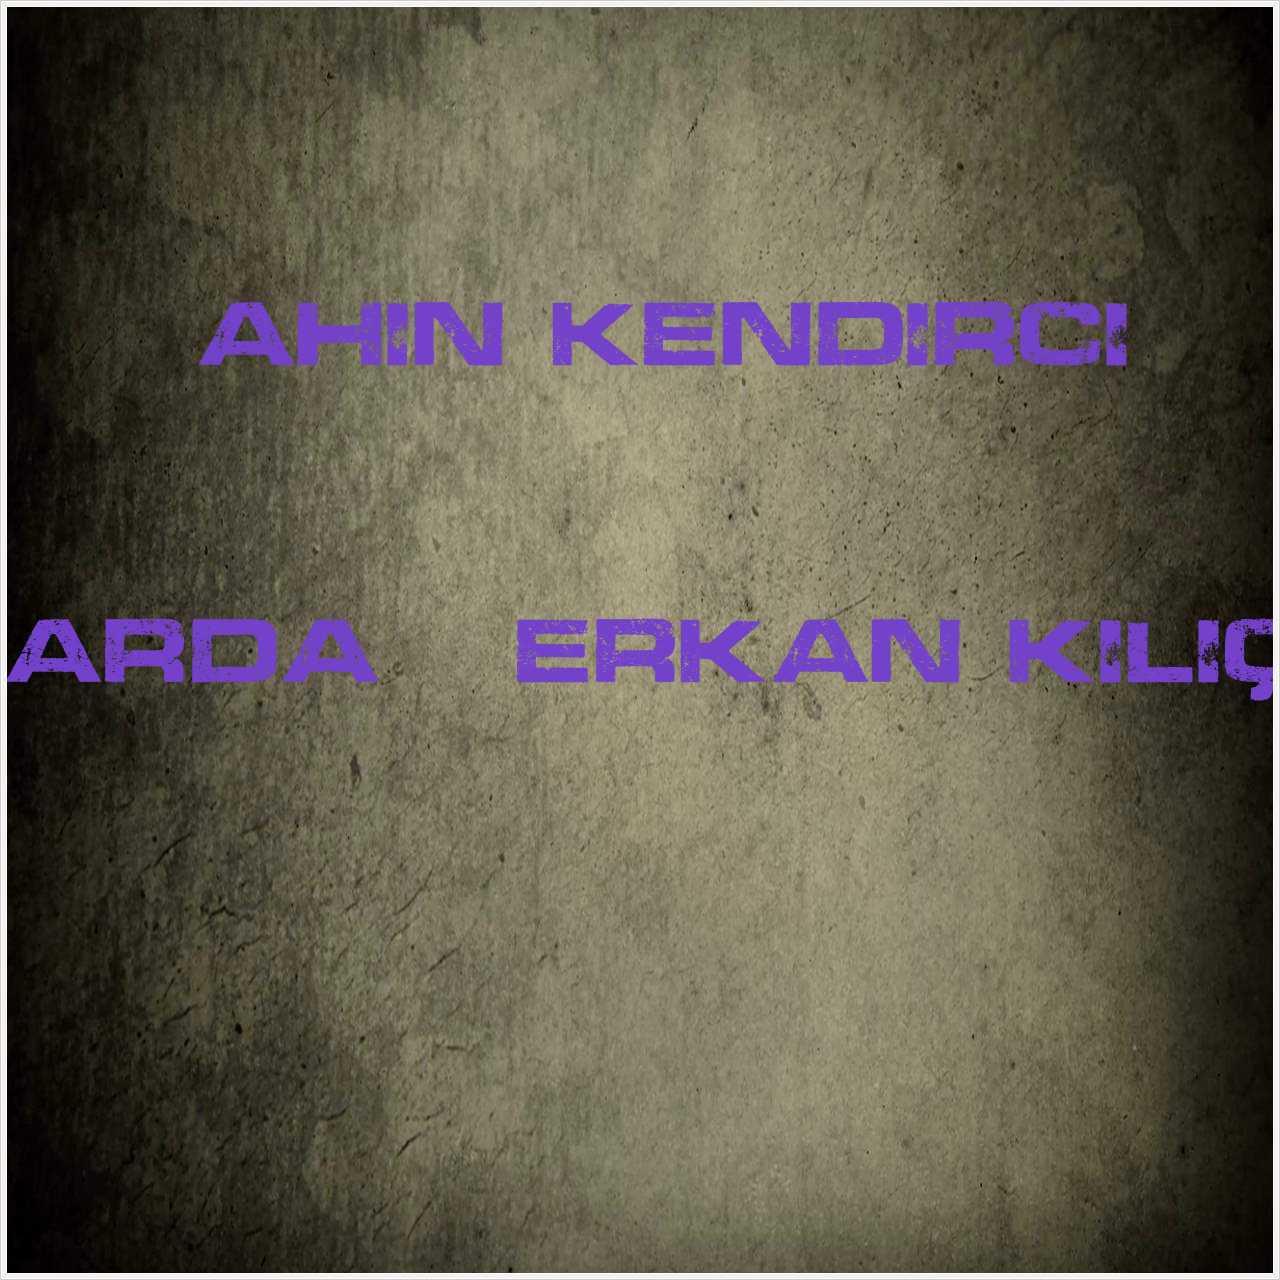 دانلود آهنگ جدید Şahin Kendirci به نام Heye Kardaş (Erkan Kılıç Remix)